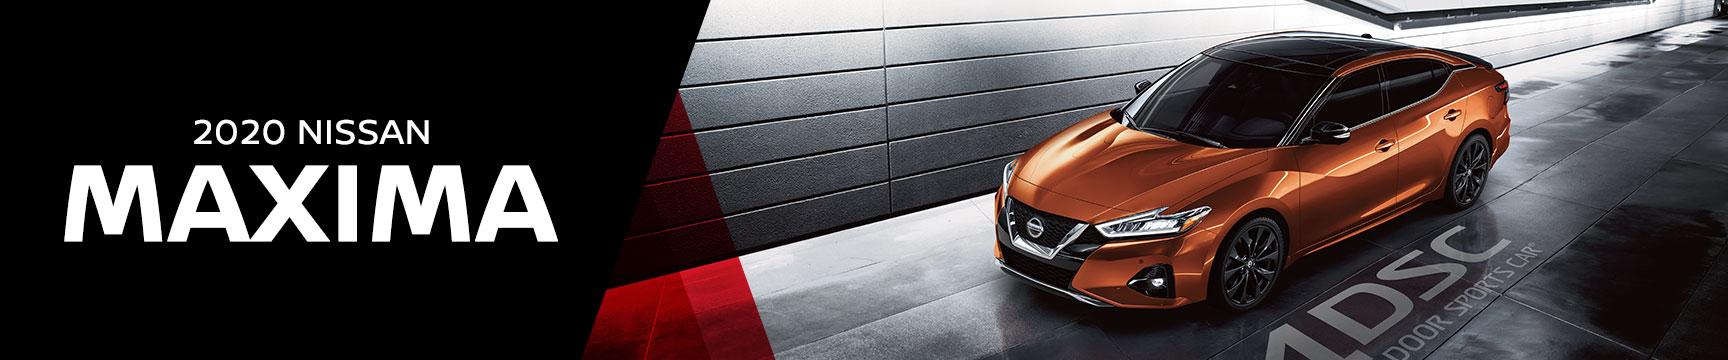 2020 Nissan Maxima Sedans in Buford, Georgia, near Atlanta